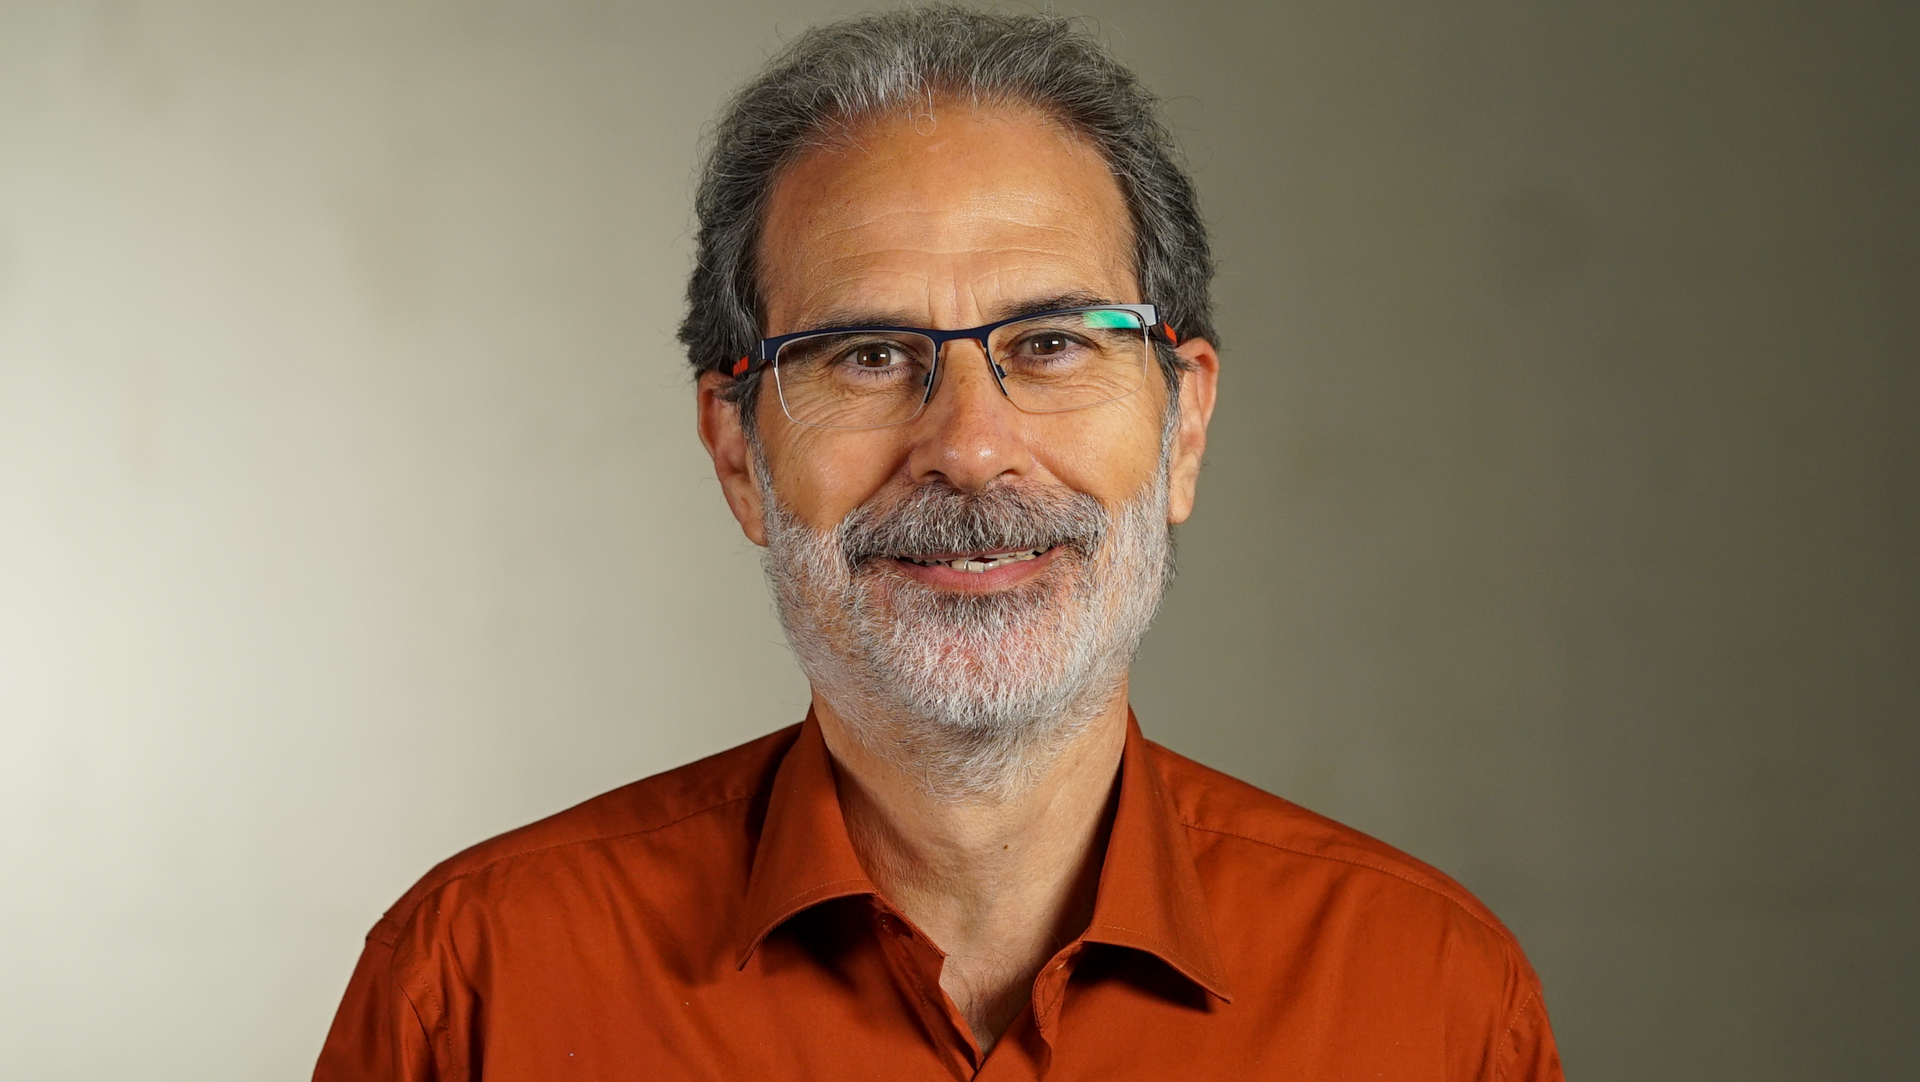 Alejandro Sánchez Grueso